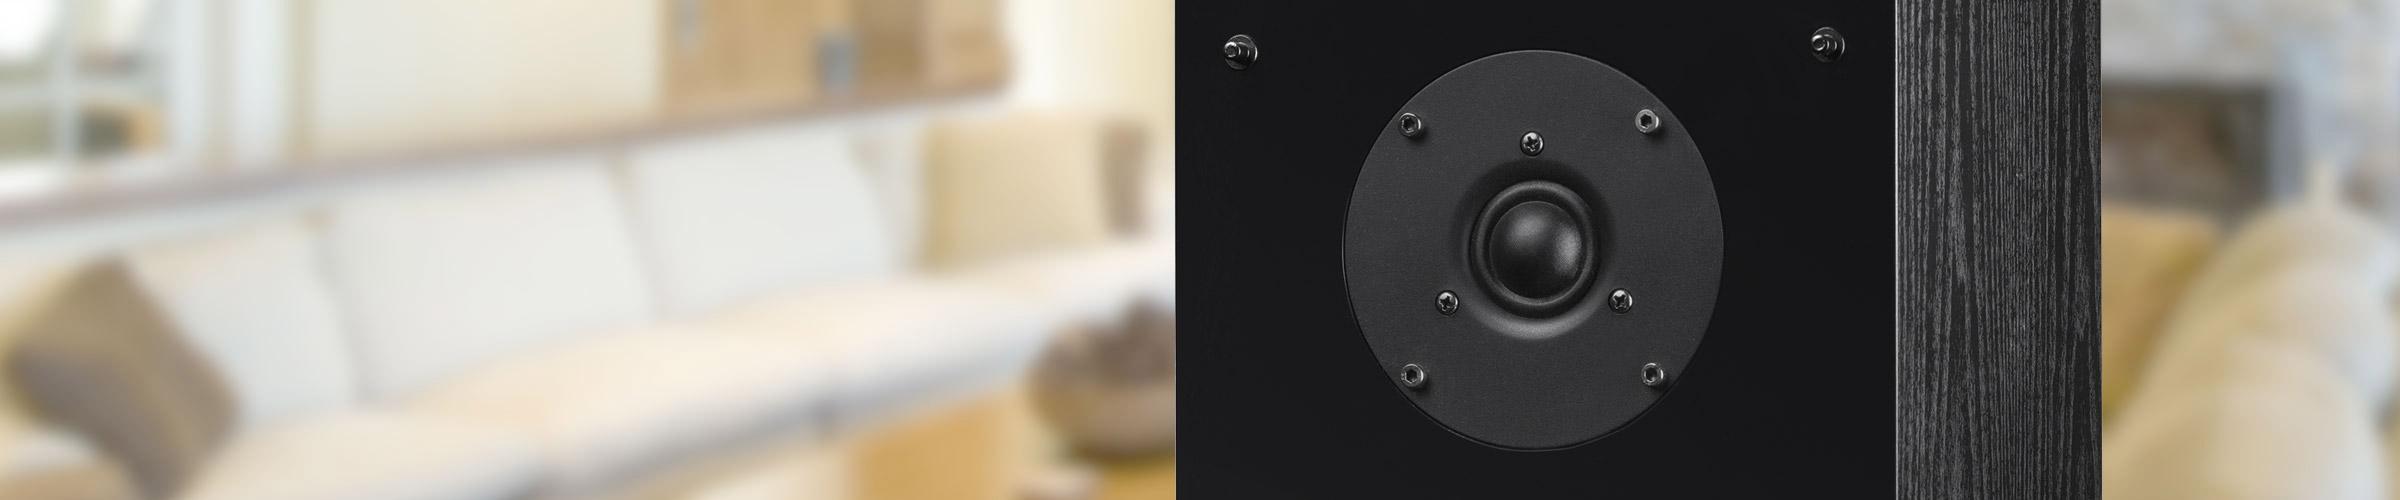 SXHTB Home Theater Speaker System Scorching Highs